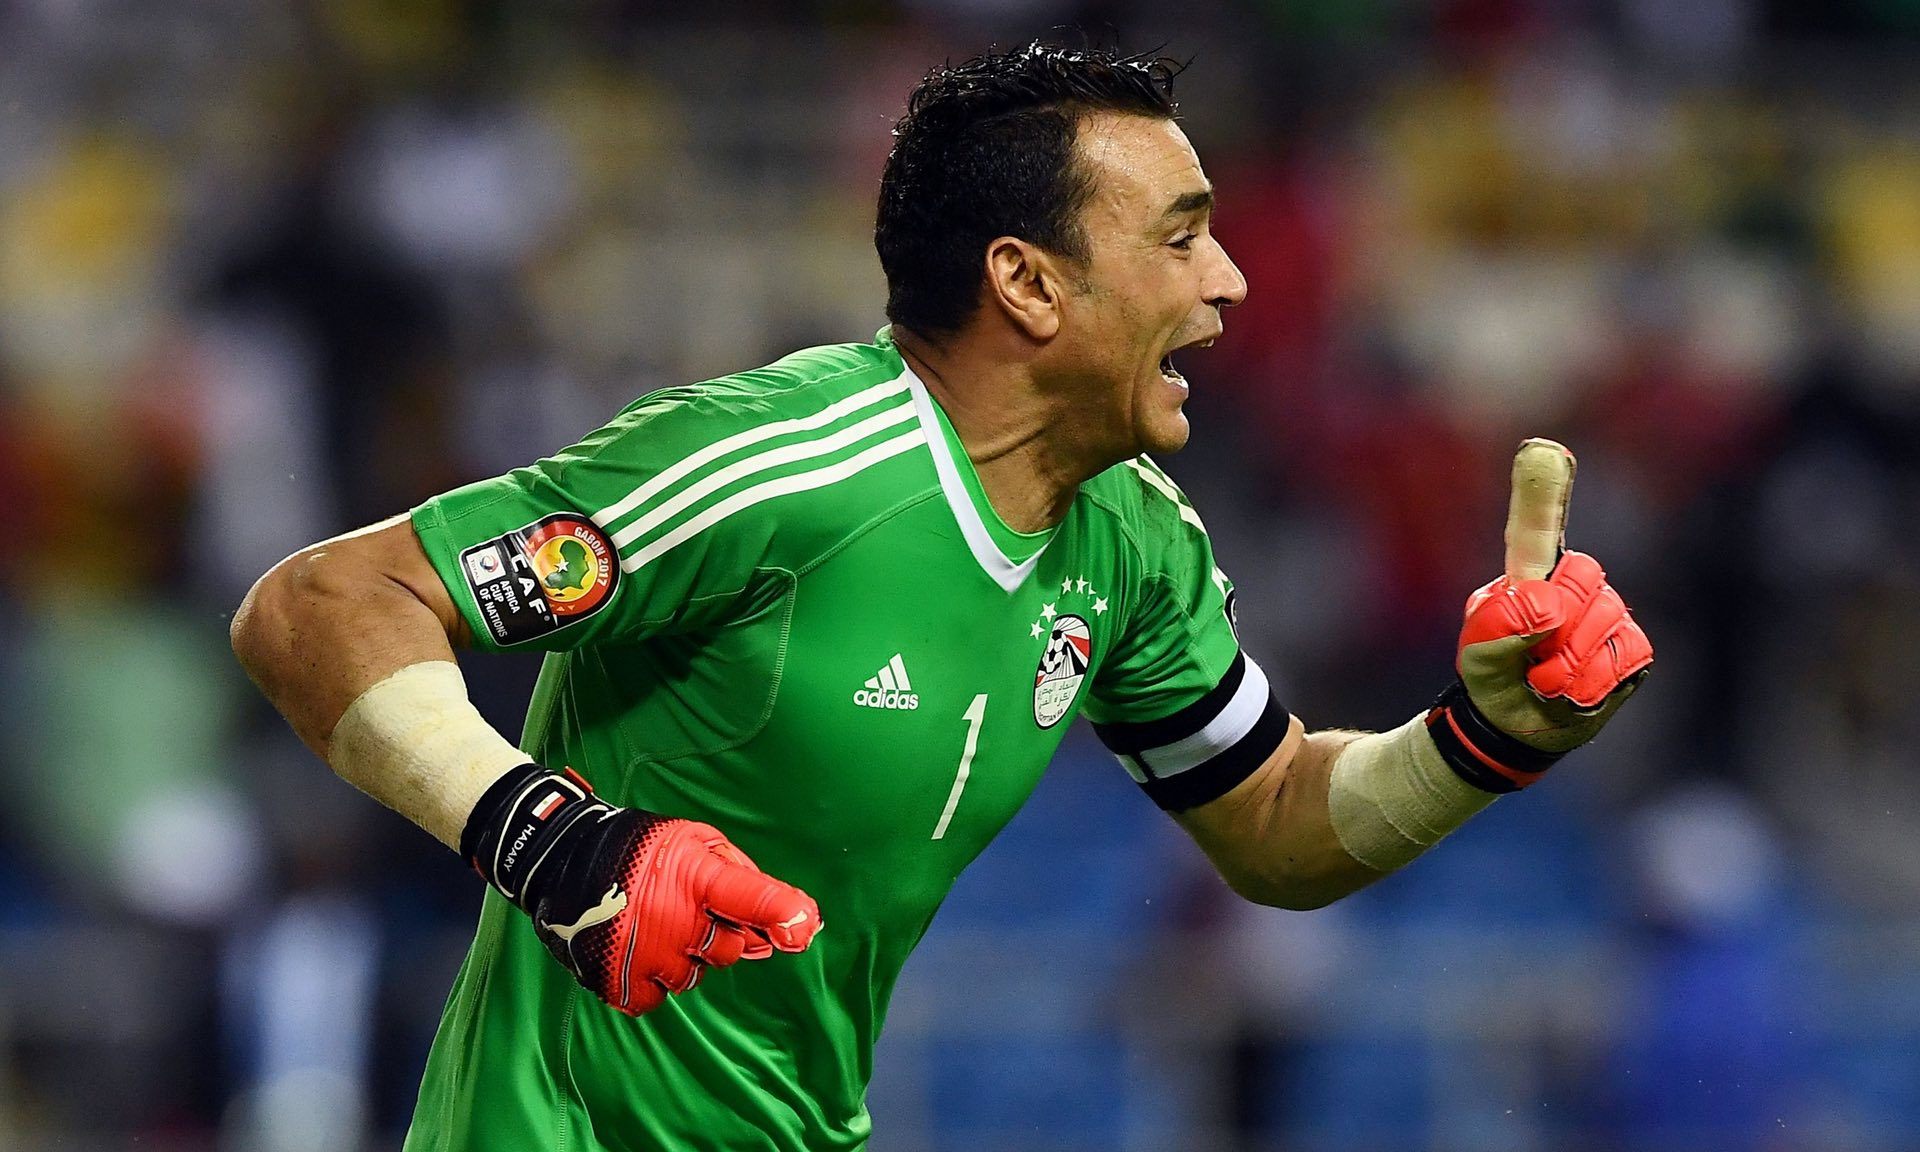 Veteran shot-stopper El Hadary hero as Egypt reach Afcon final